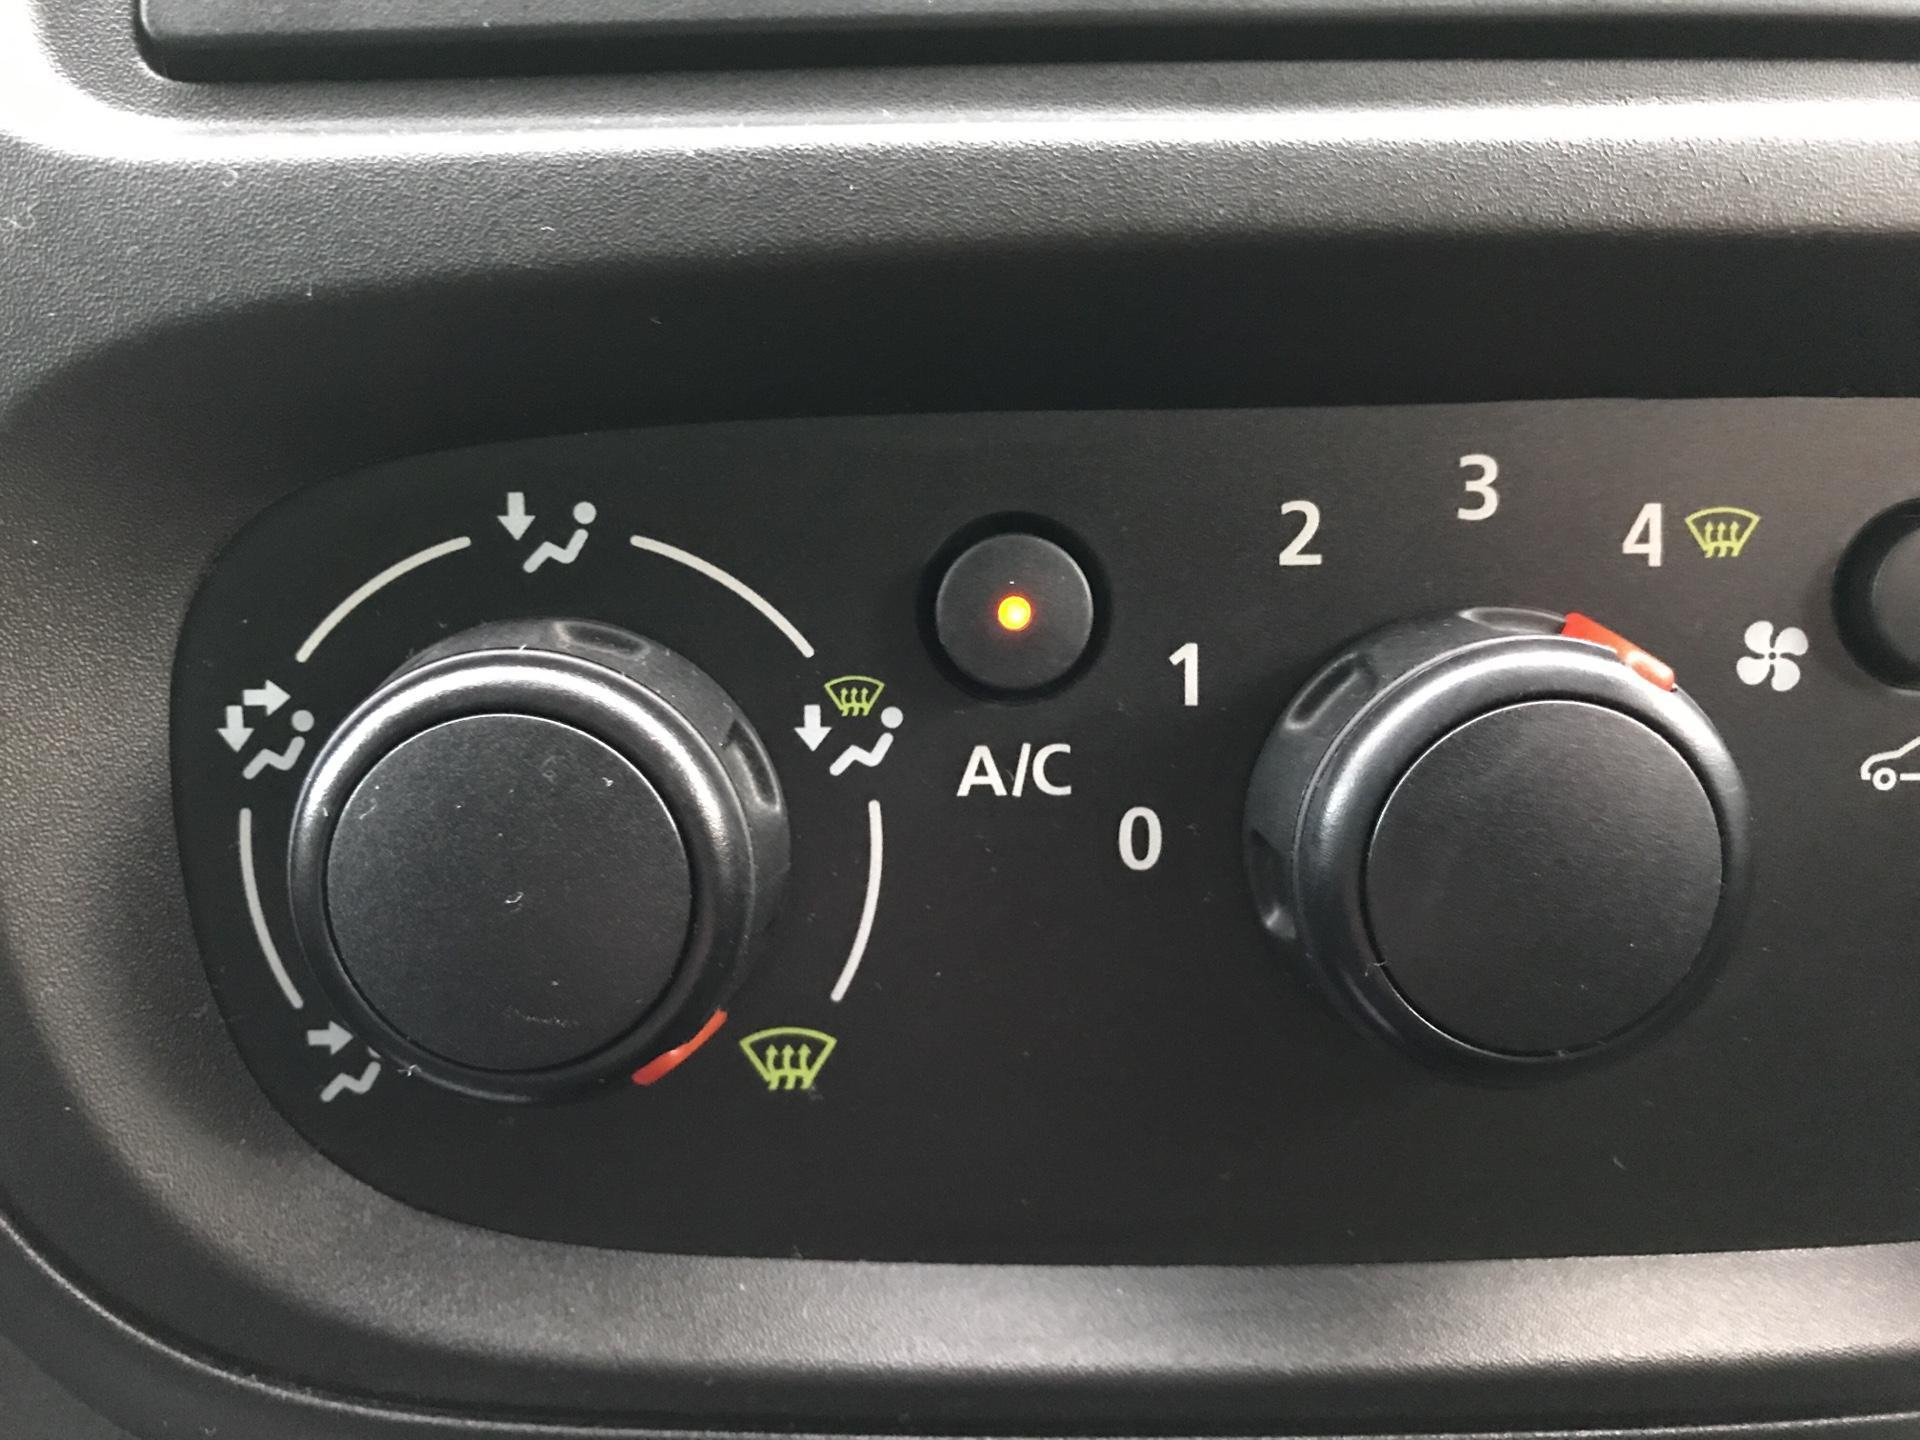 2017 Vauxhall Vivaro L2 H1 2900 1.6 CDTI 95PS EURO 6 (VALUE RANGE VEHICLE - CONDITION REFLECTED IN PRICE) (BK17OJZ) Image 15